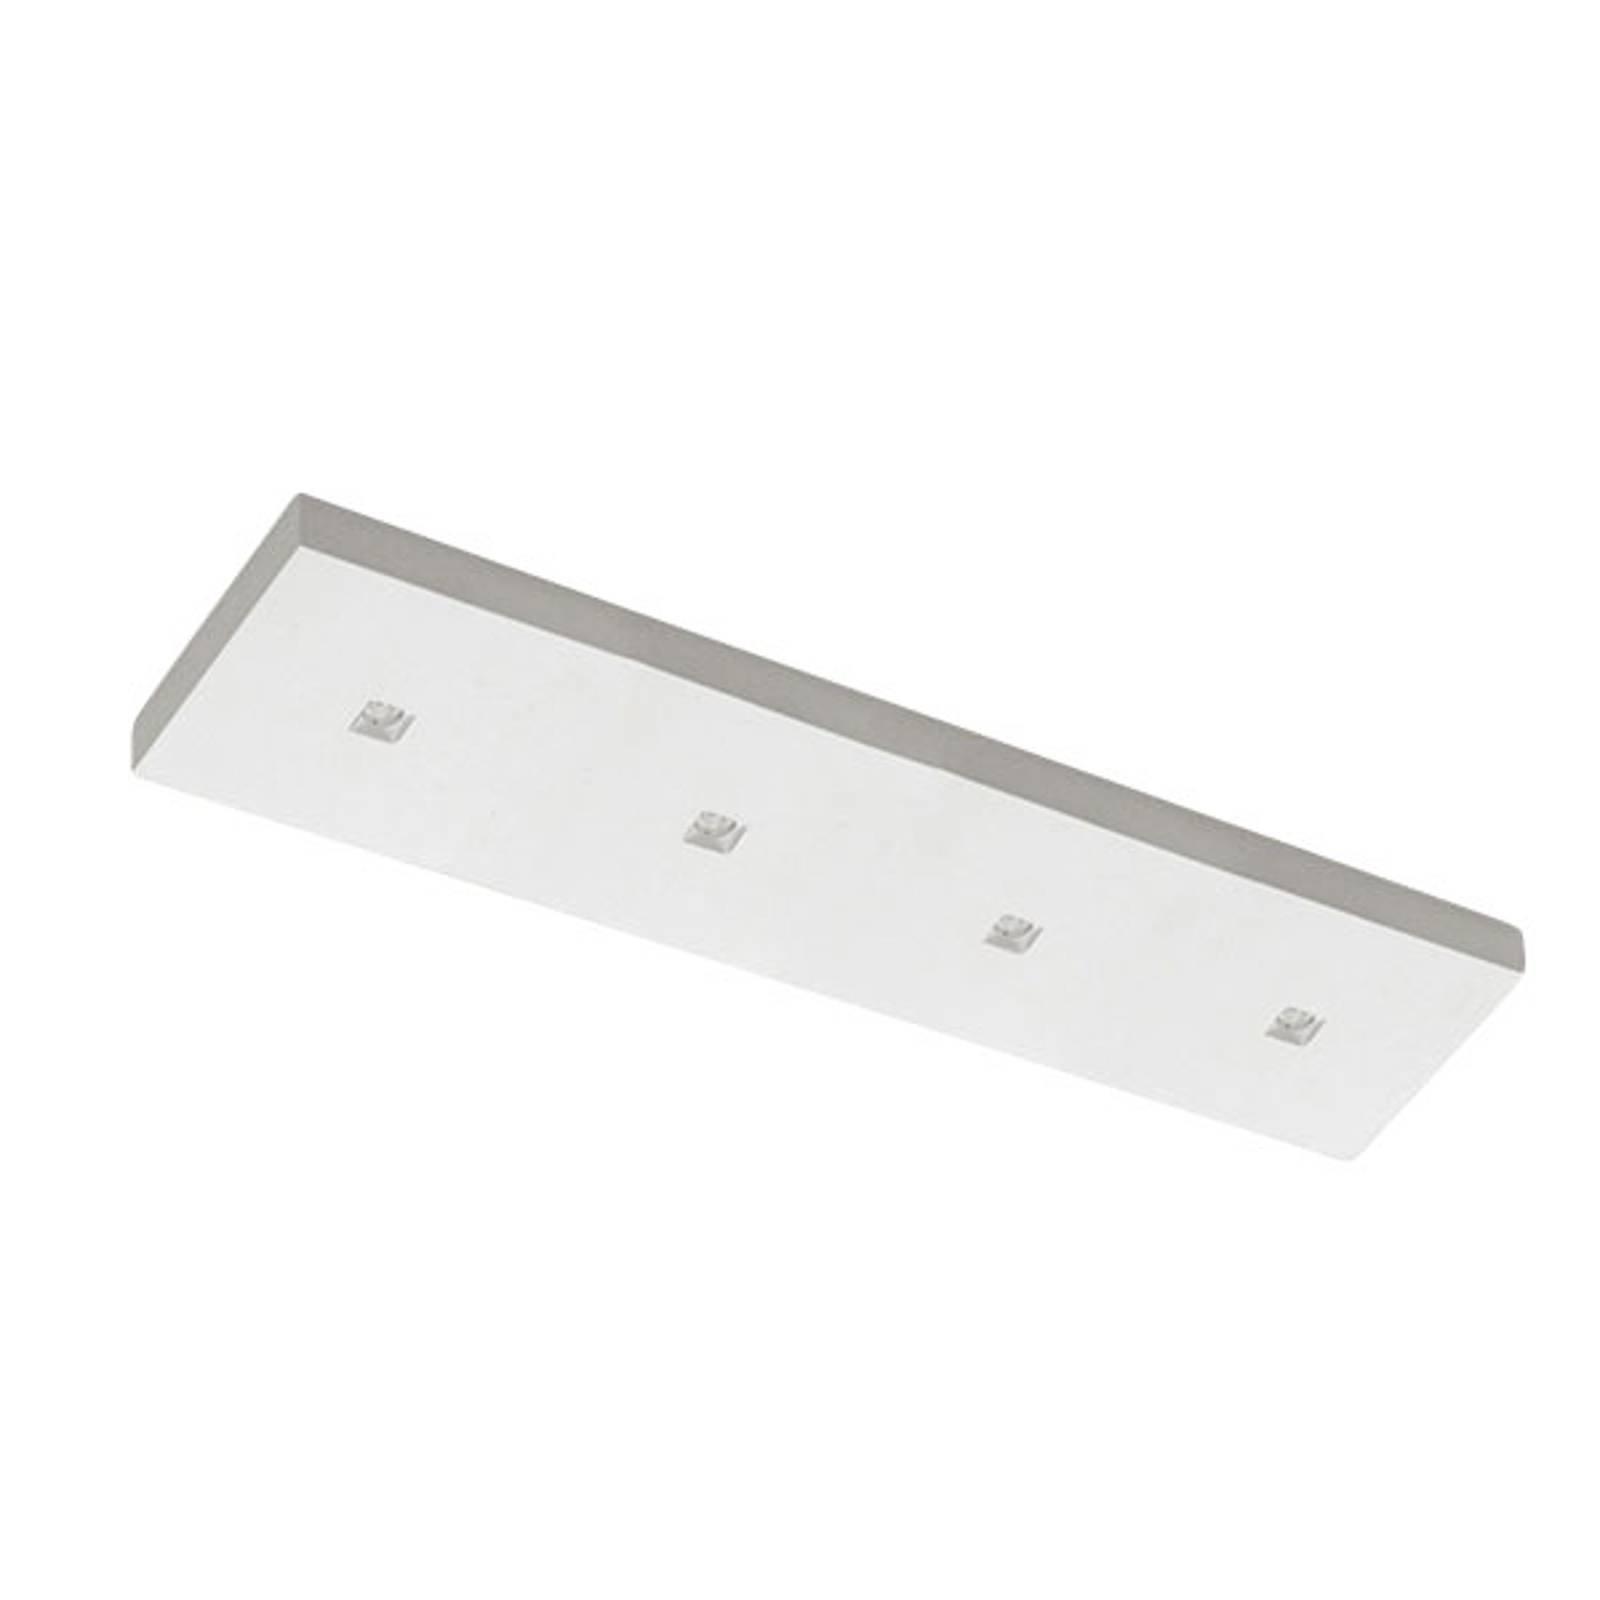 LED-taklampe 8914D, fire lys, 2 700 K, dimbar